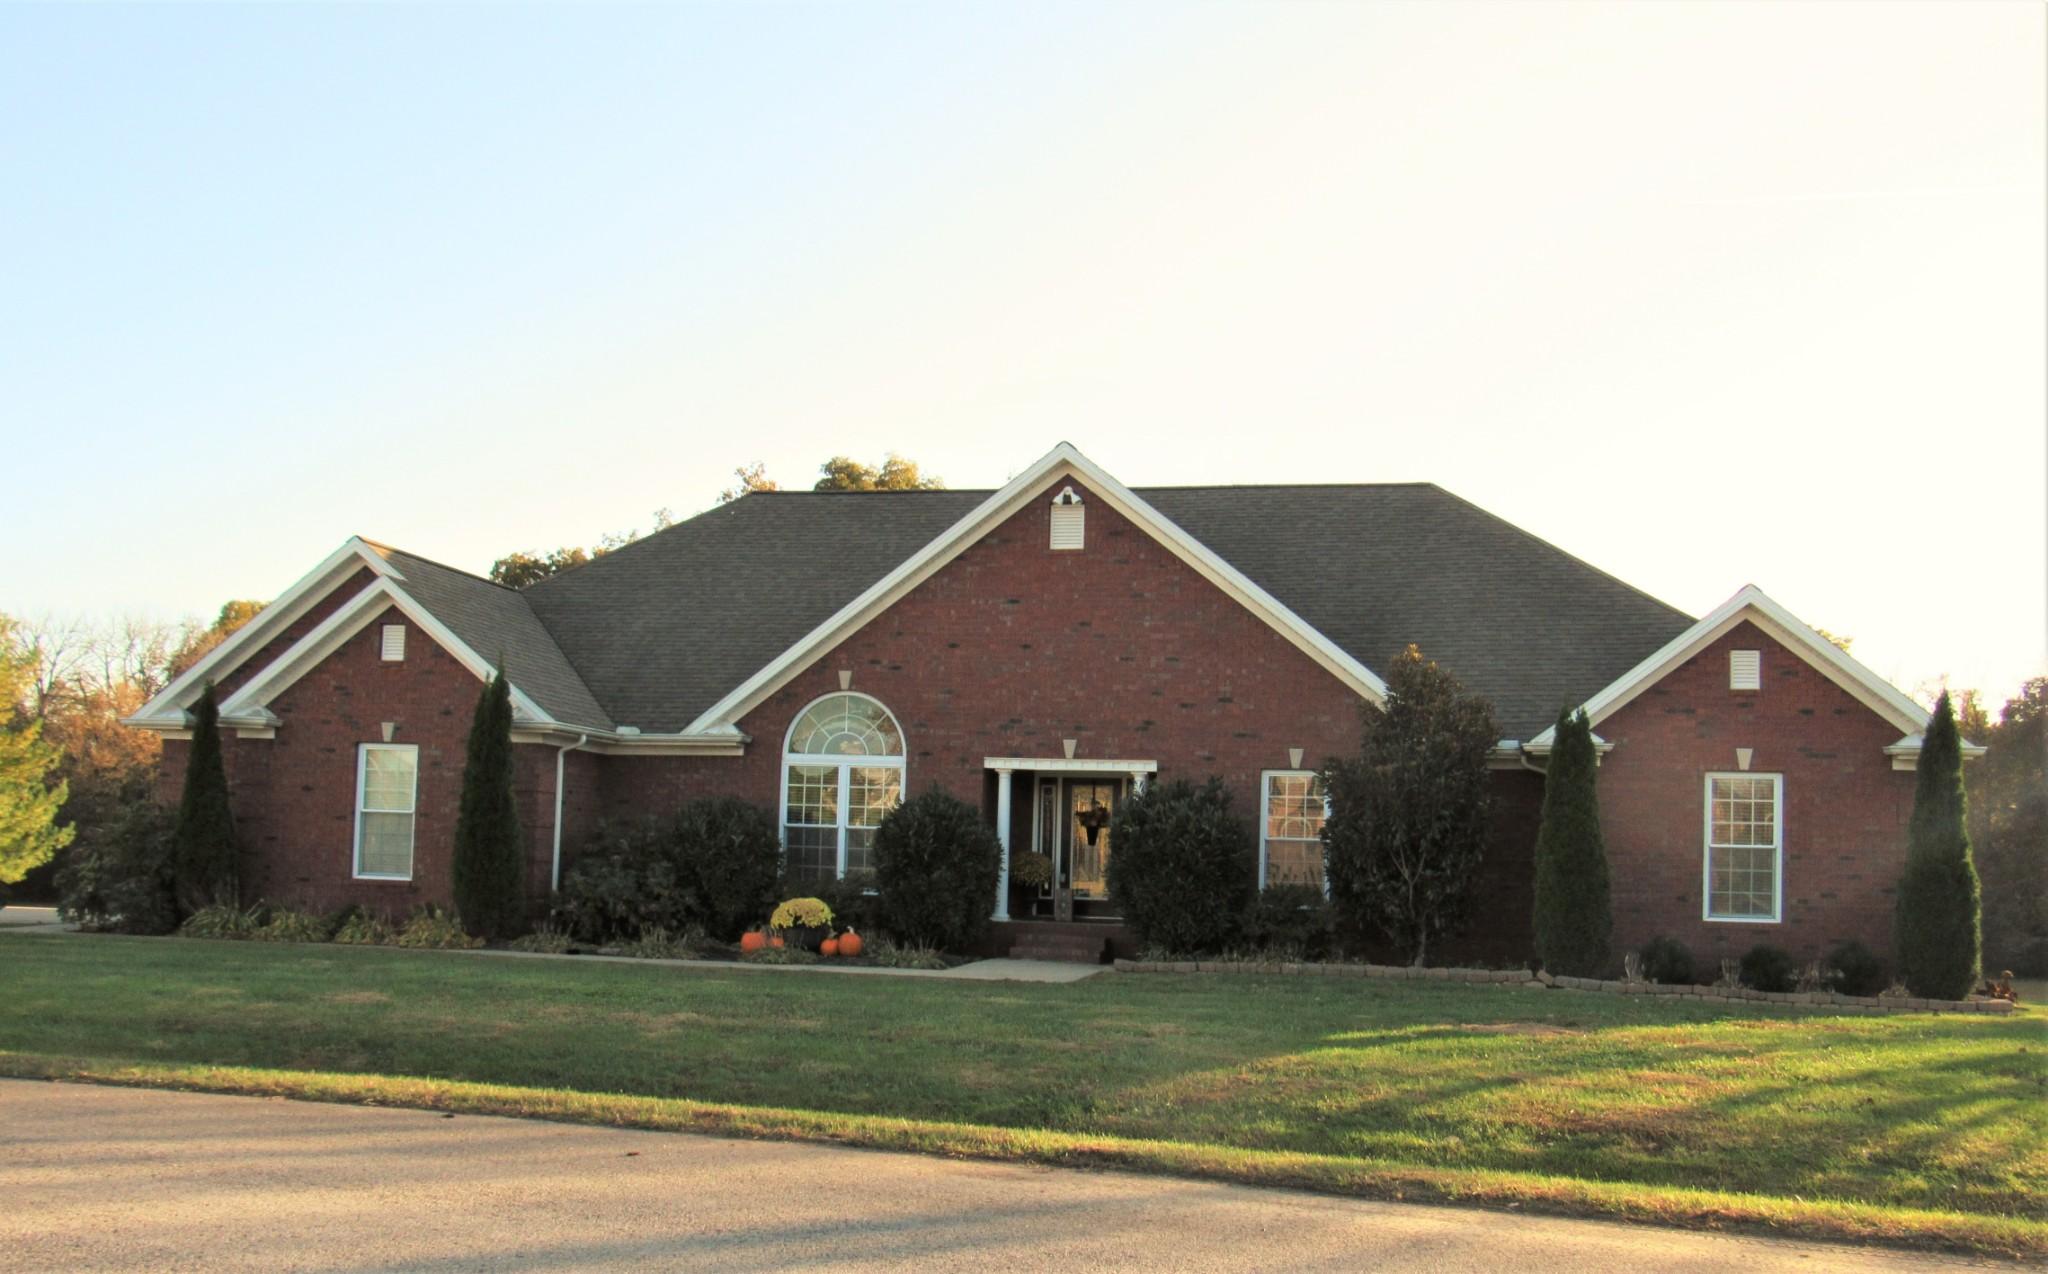 165 Romeo Dr, Hopkinsville, KY 42240 - Hopkinsville, KY real estate listing